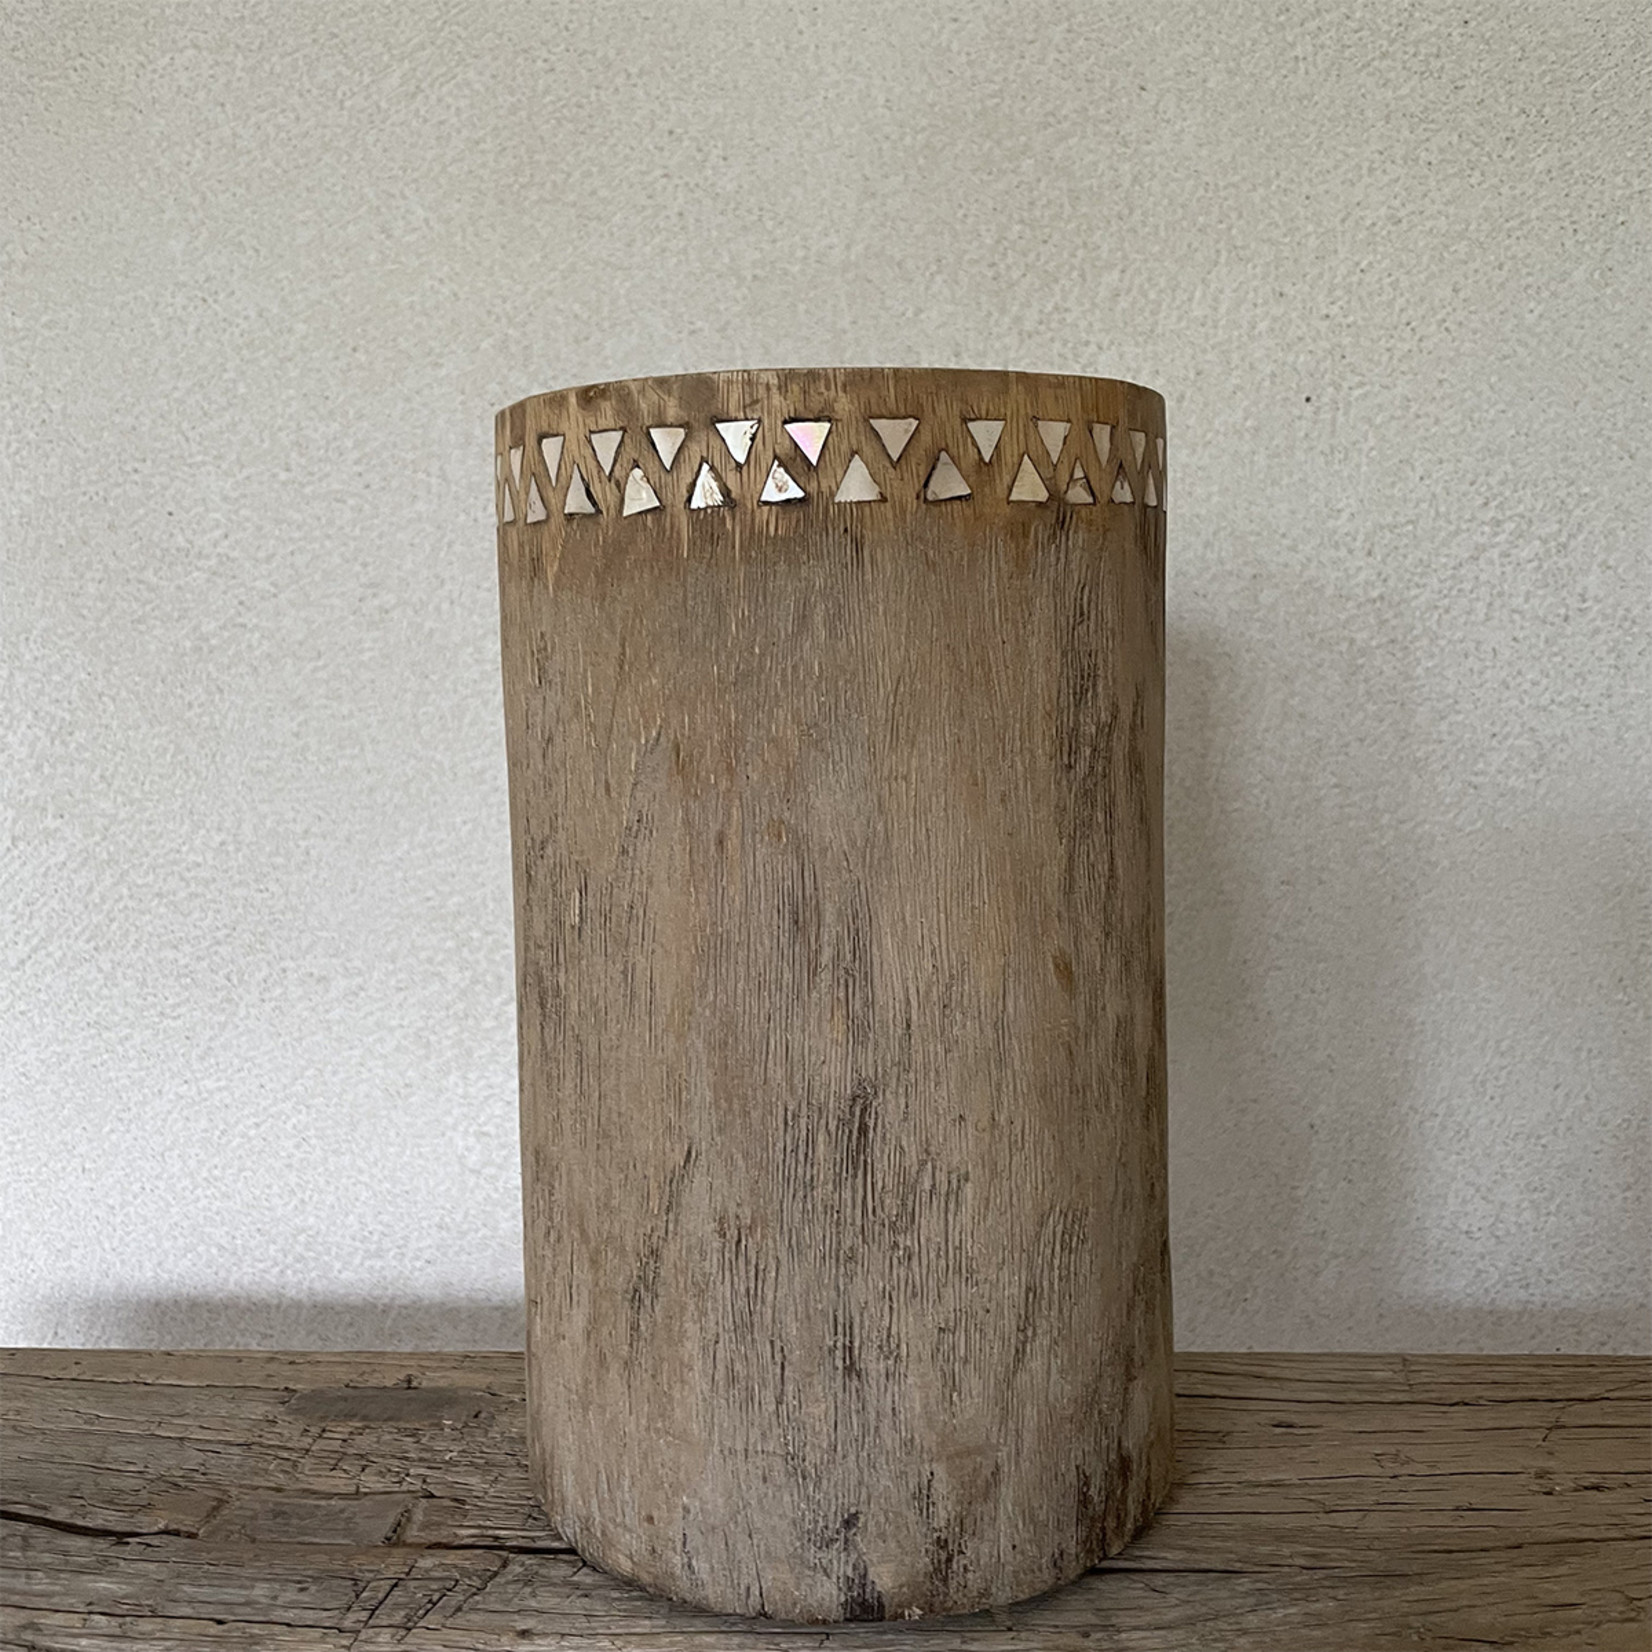 Small mortar